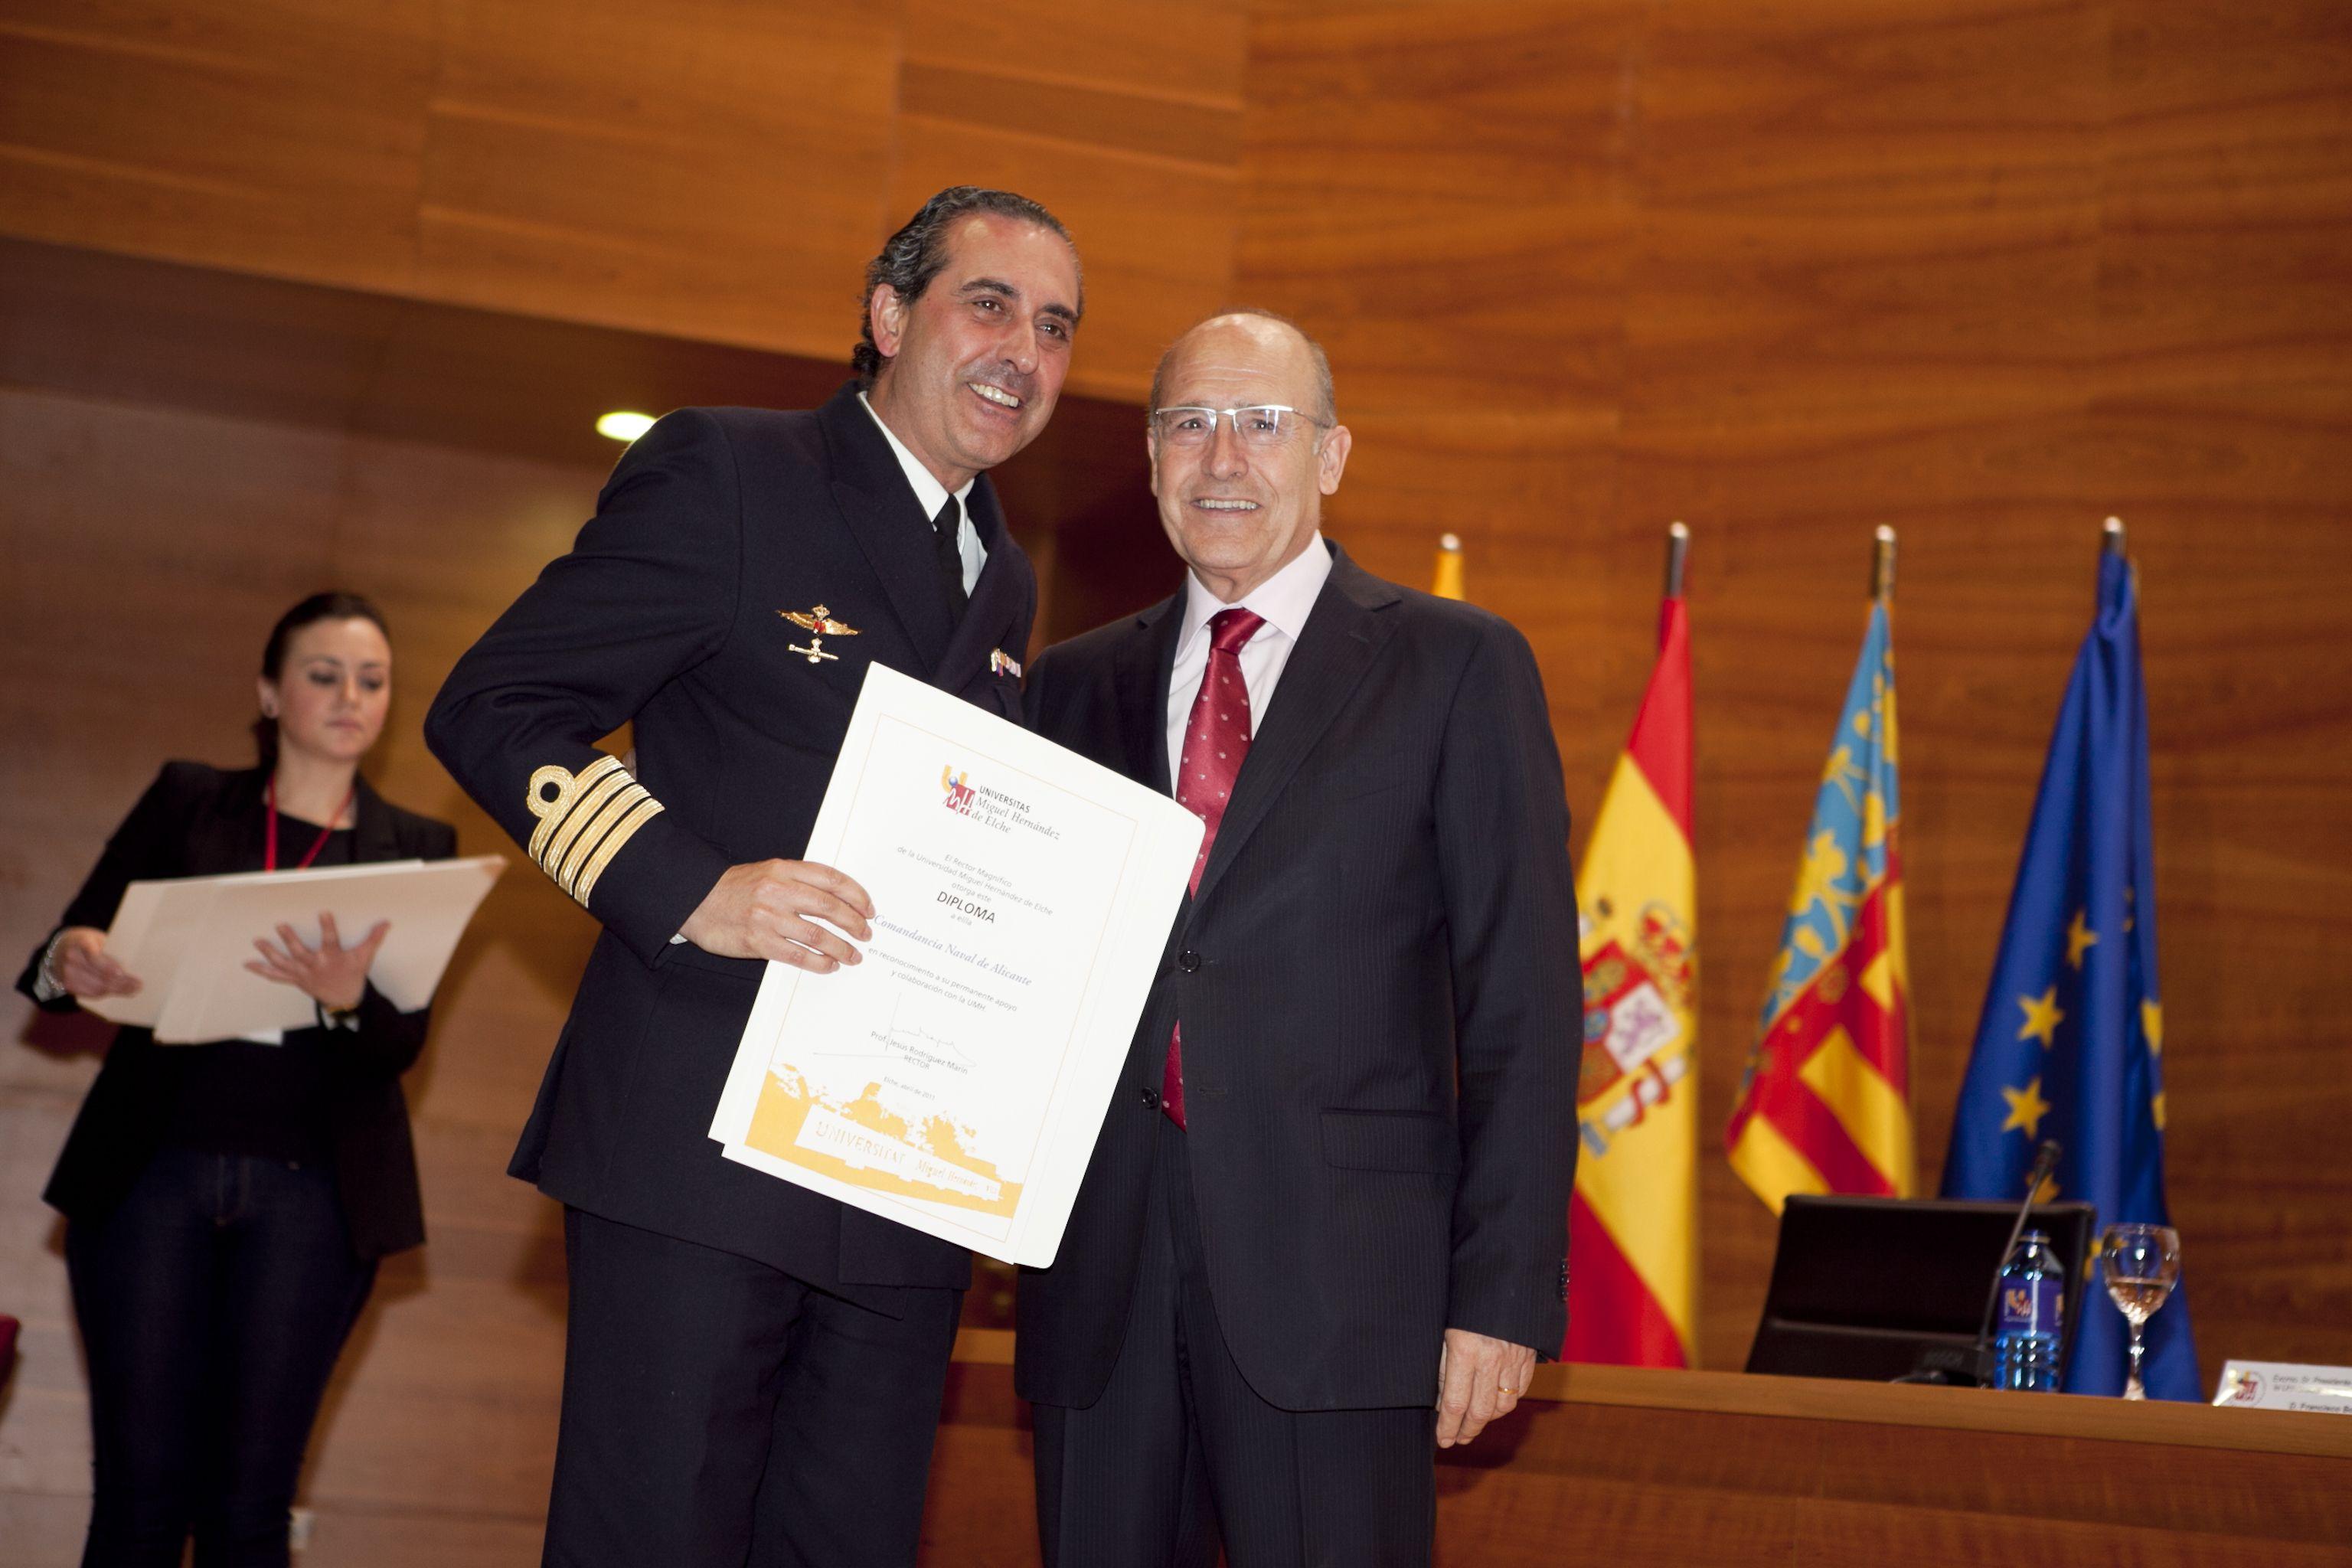 umh-diplomas-rector_mg_7003.jpg